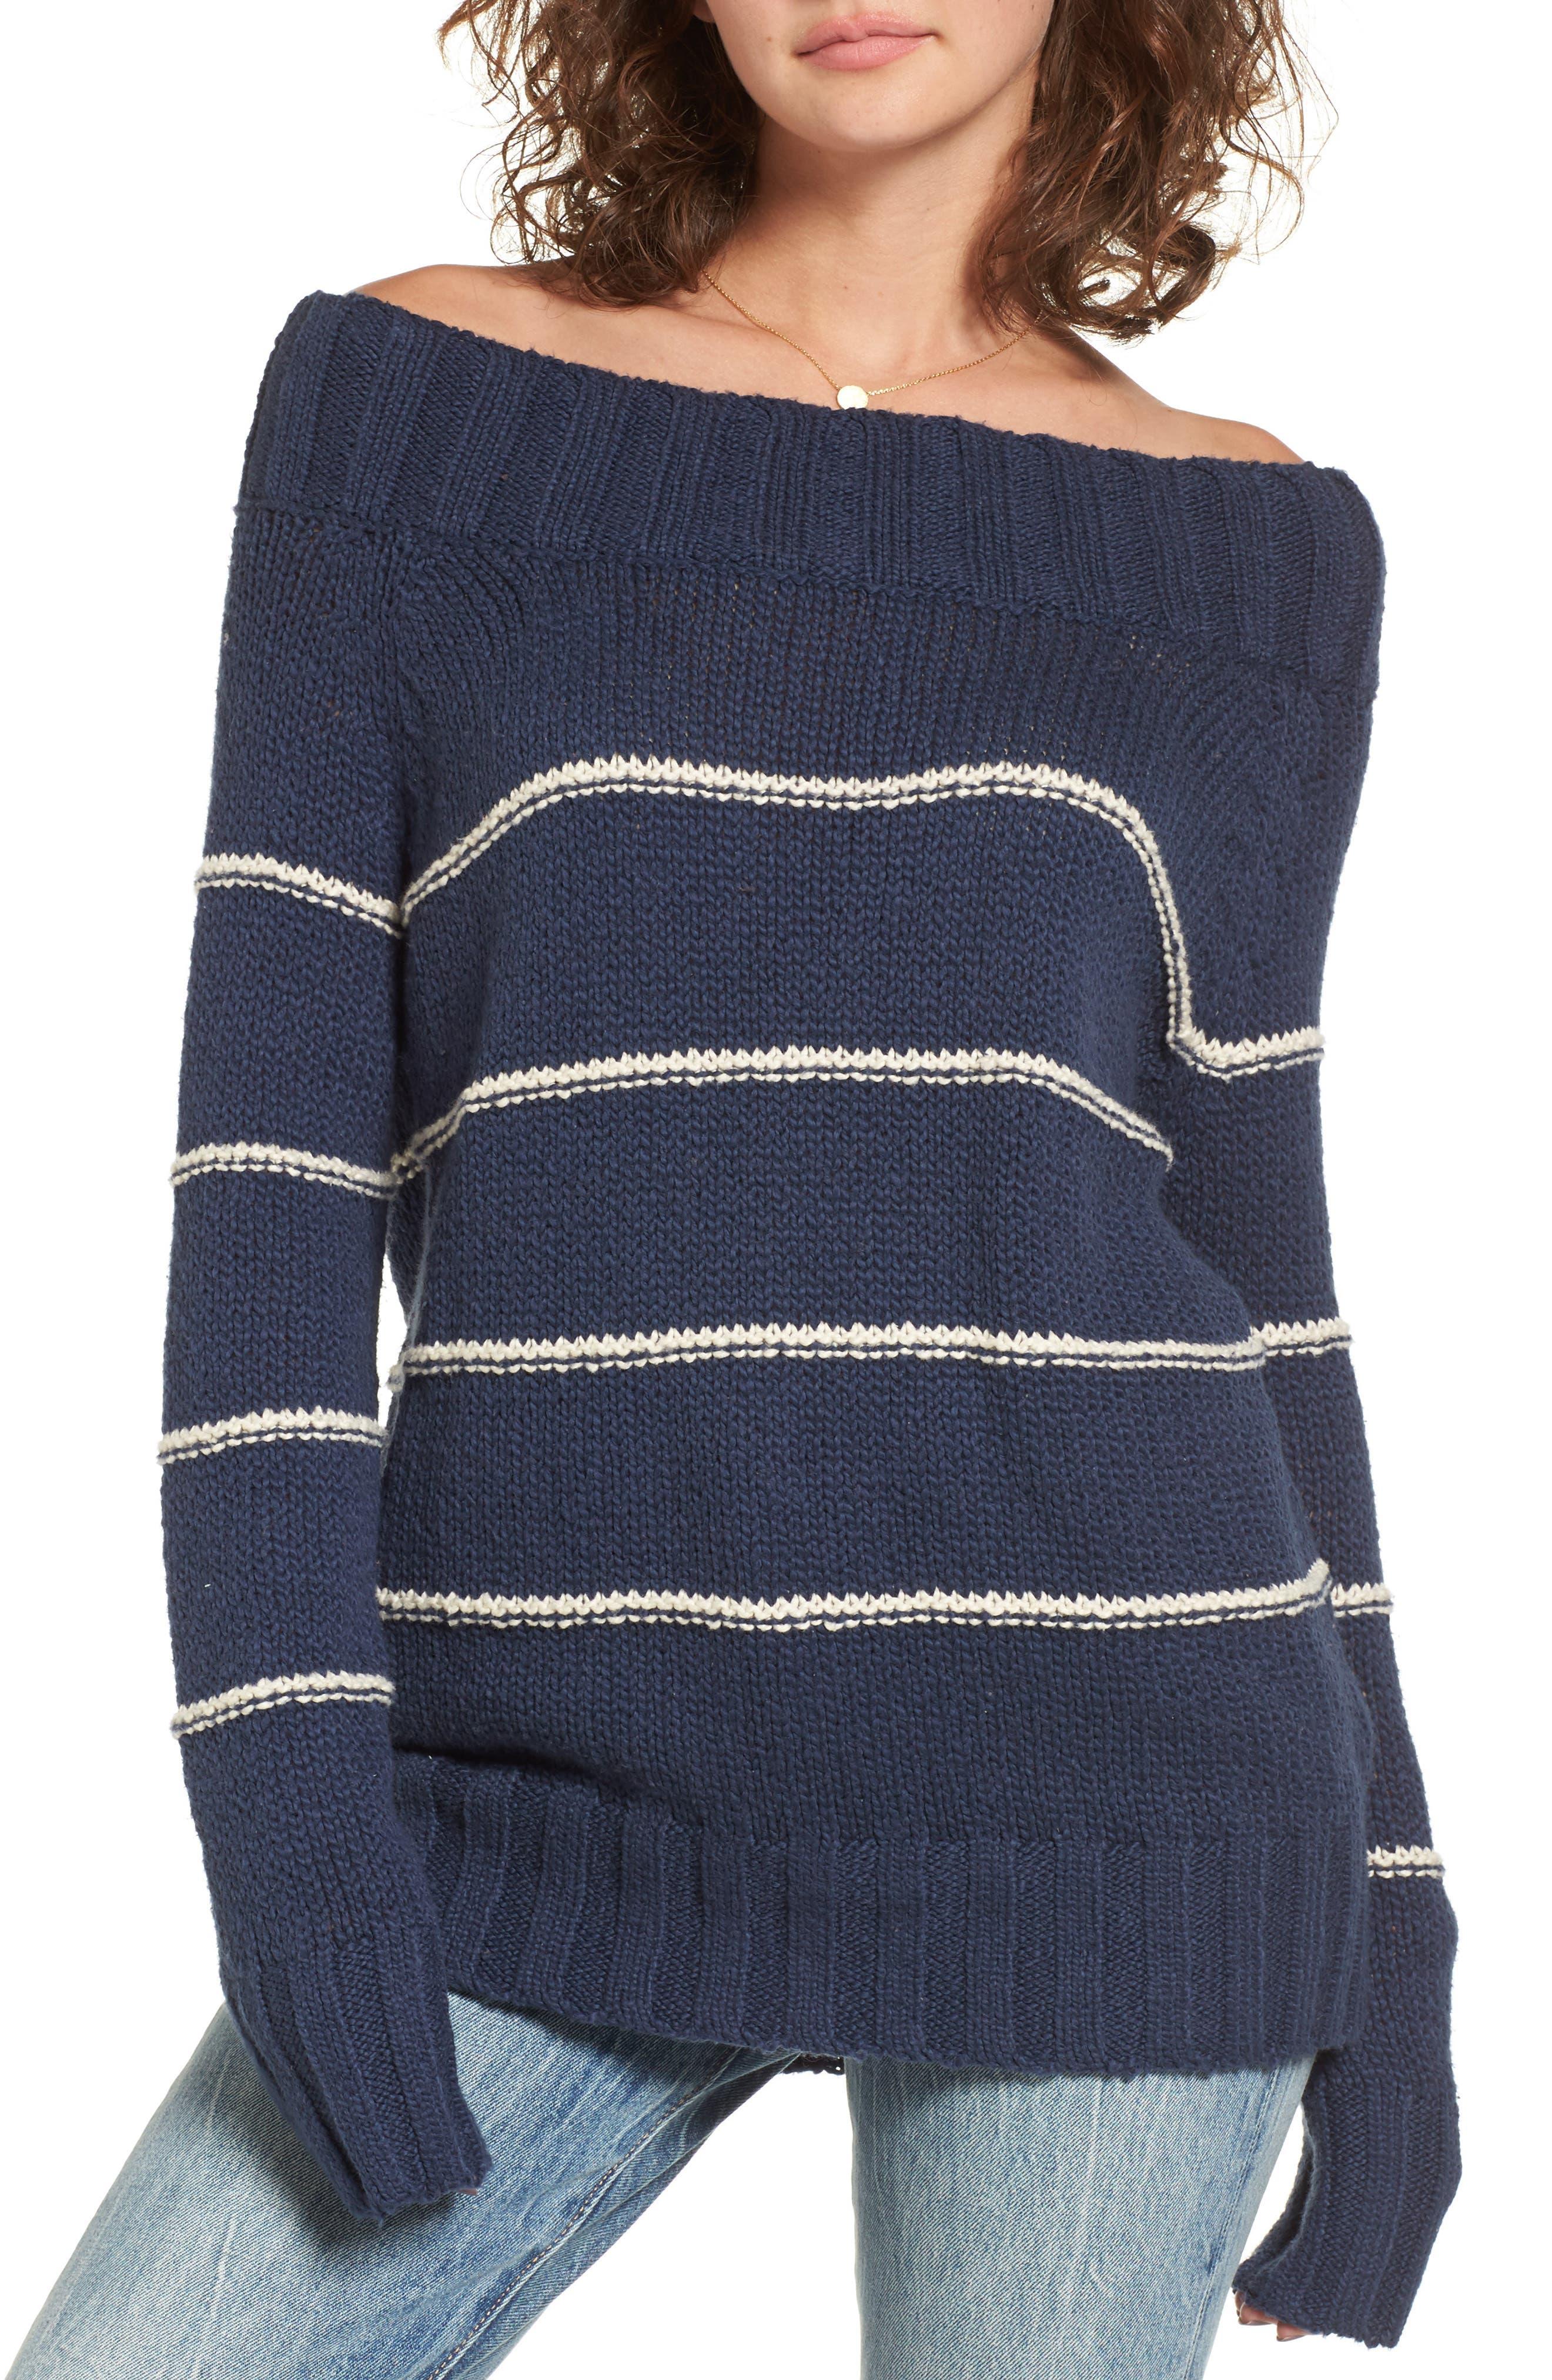 BILLABONG,                             Snuggle Down Off the Shoulder Sweater,                             Alternate thumbnail 4, color,                             400